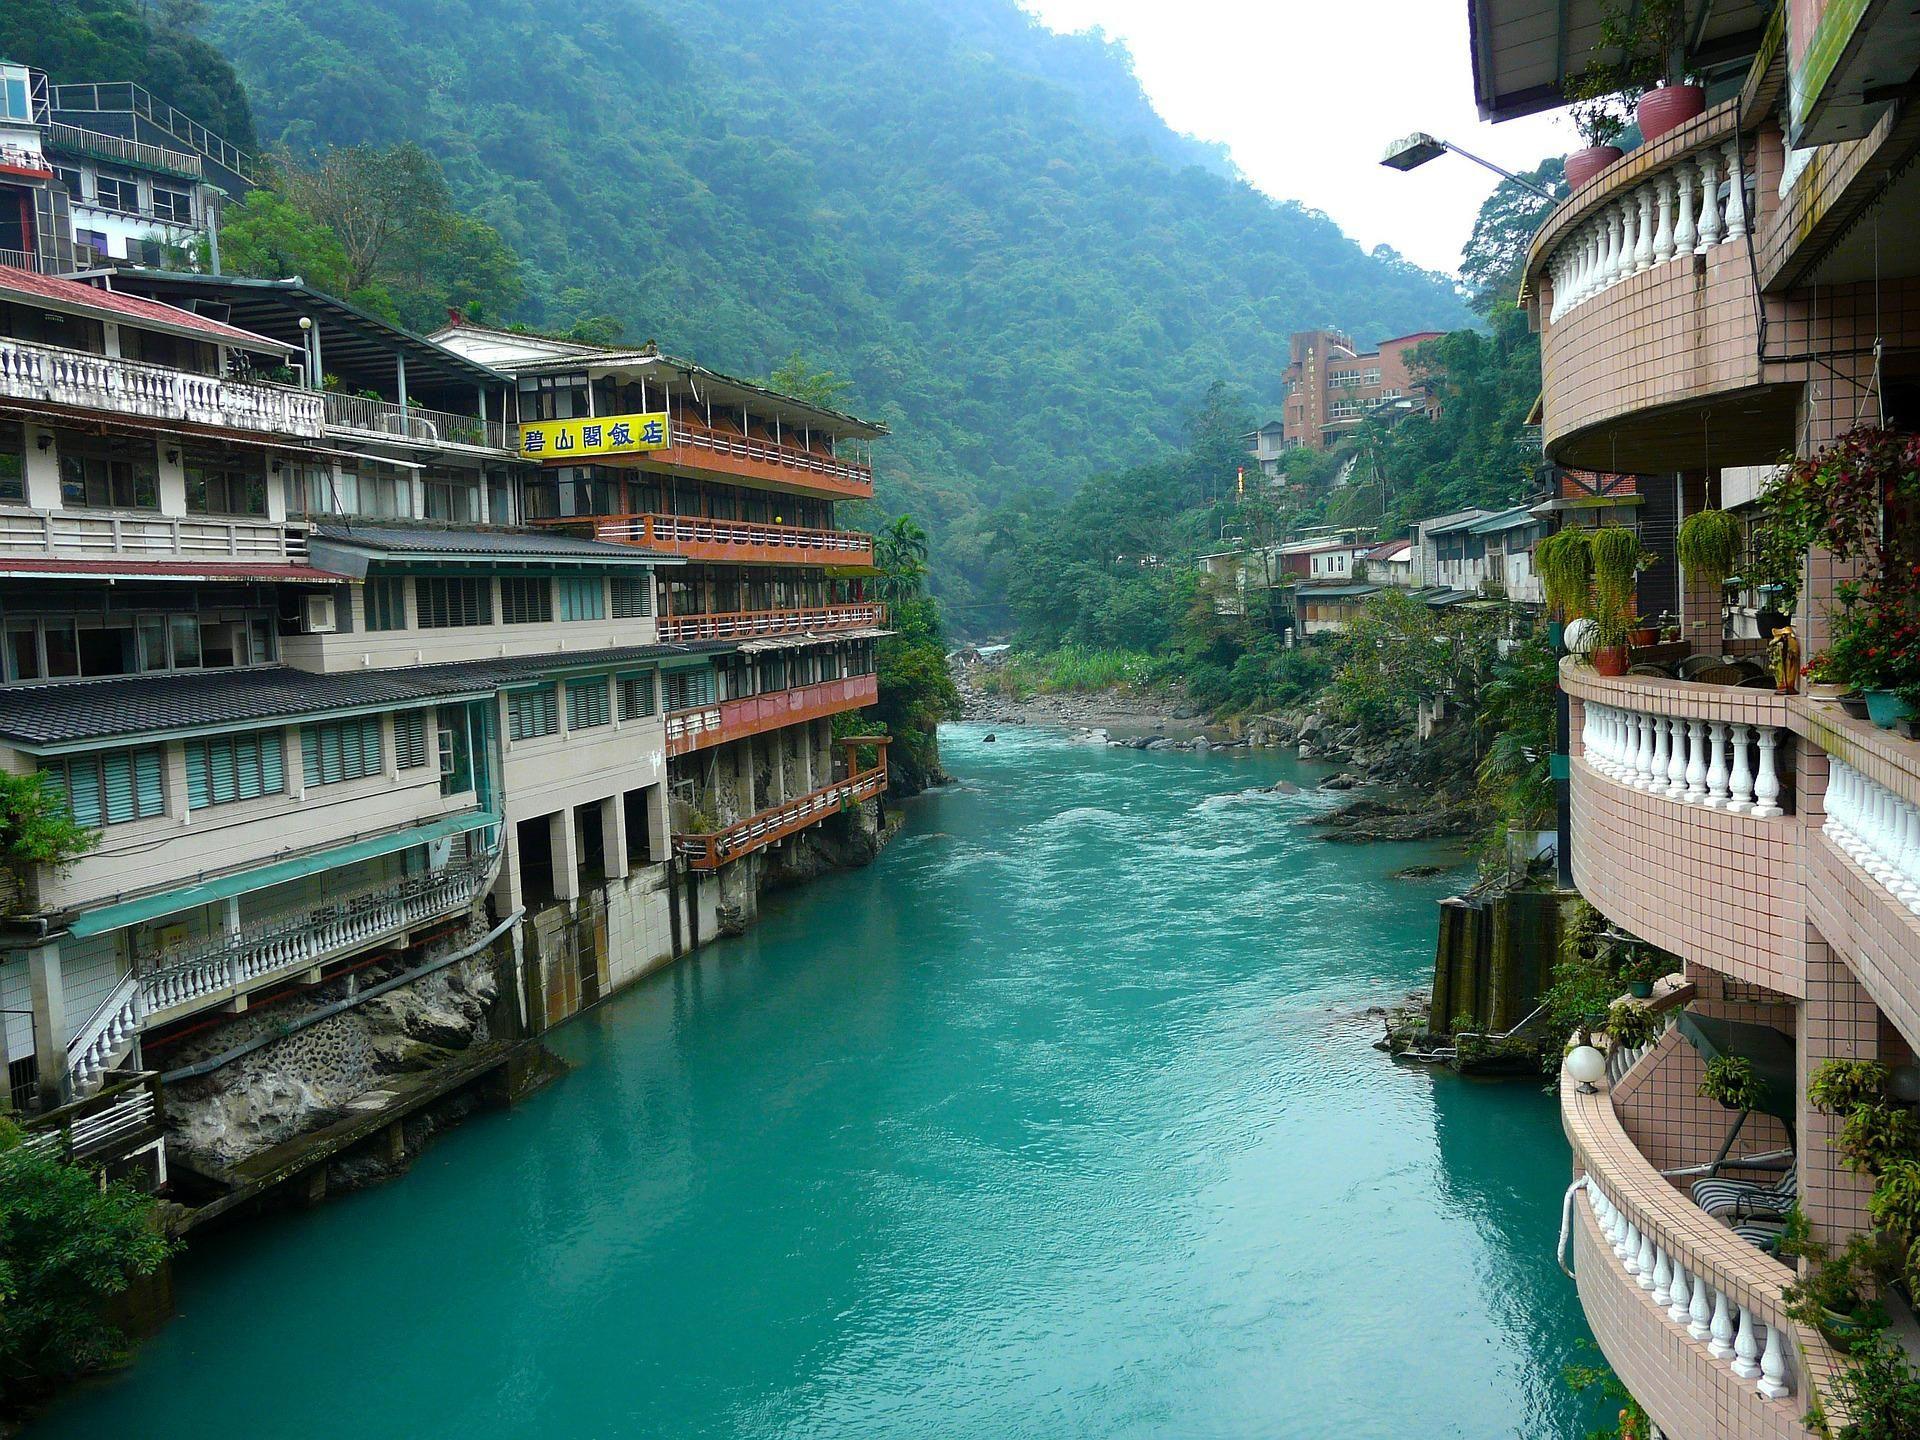 Wulai Atayal Aboriginal Village and Hot Springs (烏來) | Taipei travel, Top  10 tourist destinations, Taipei travel guide